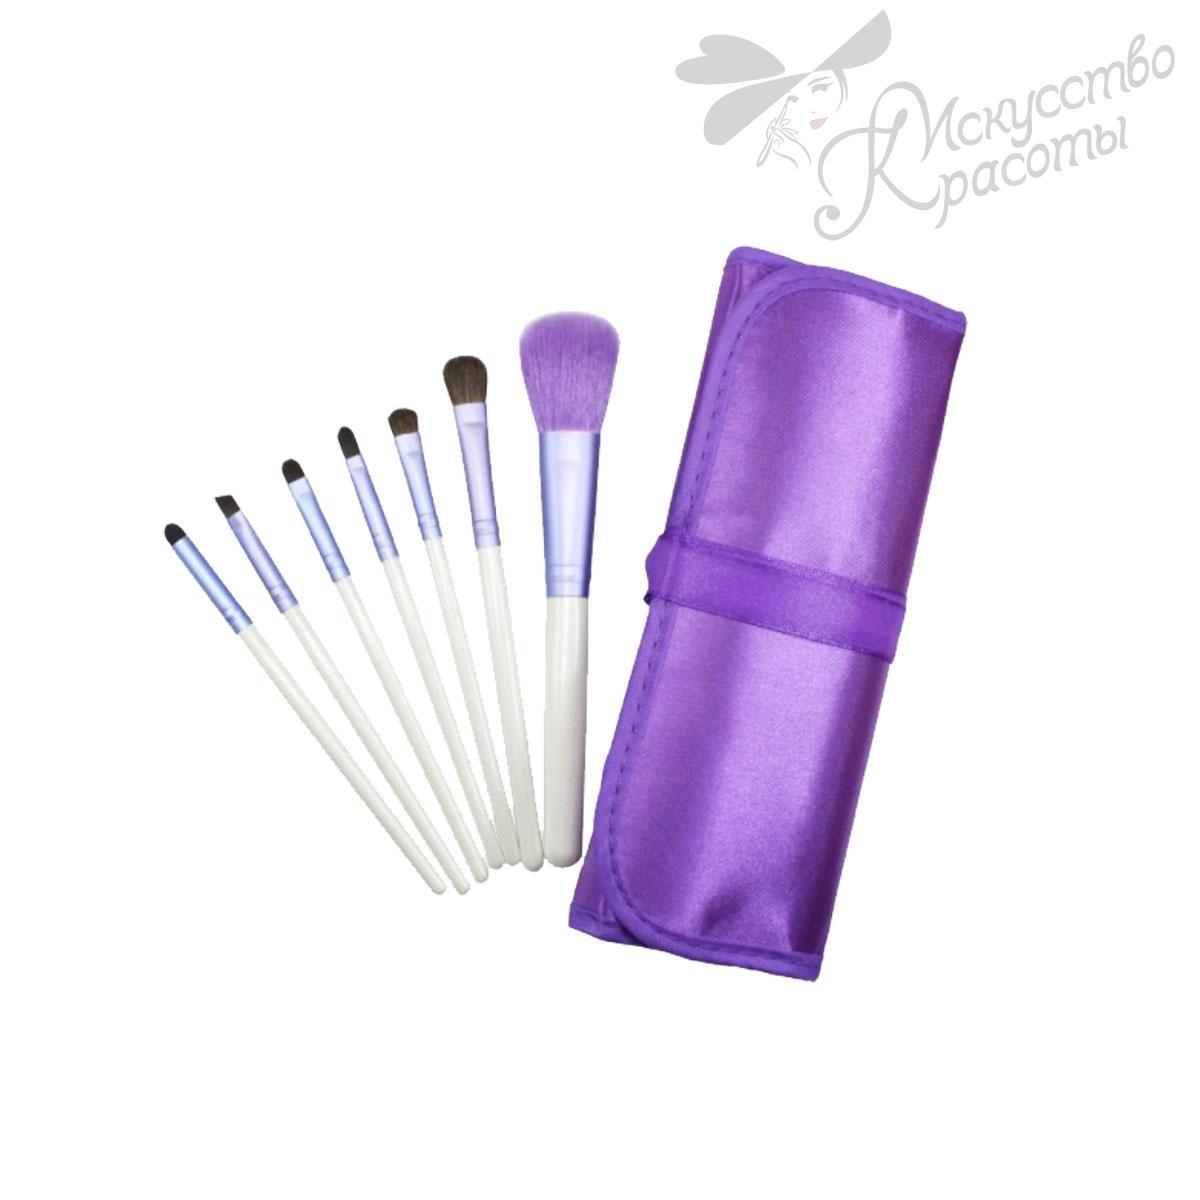 Набор кистей для макияжа PURPLE-7 Make Up Me 7 шт